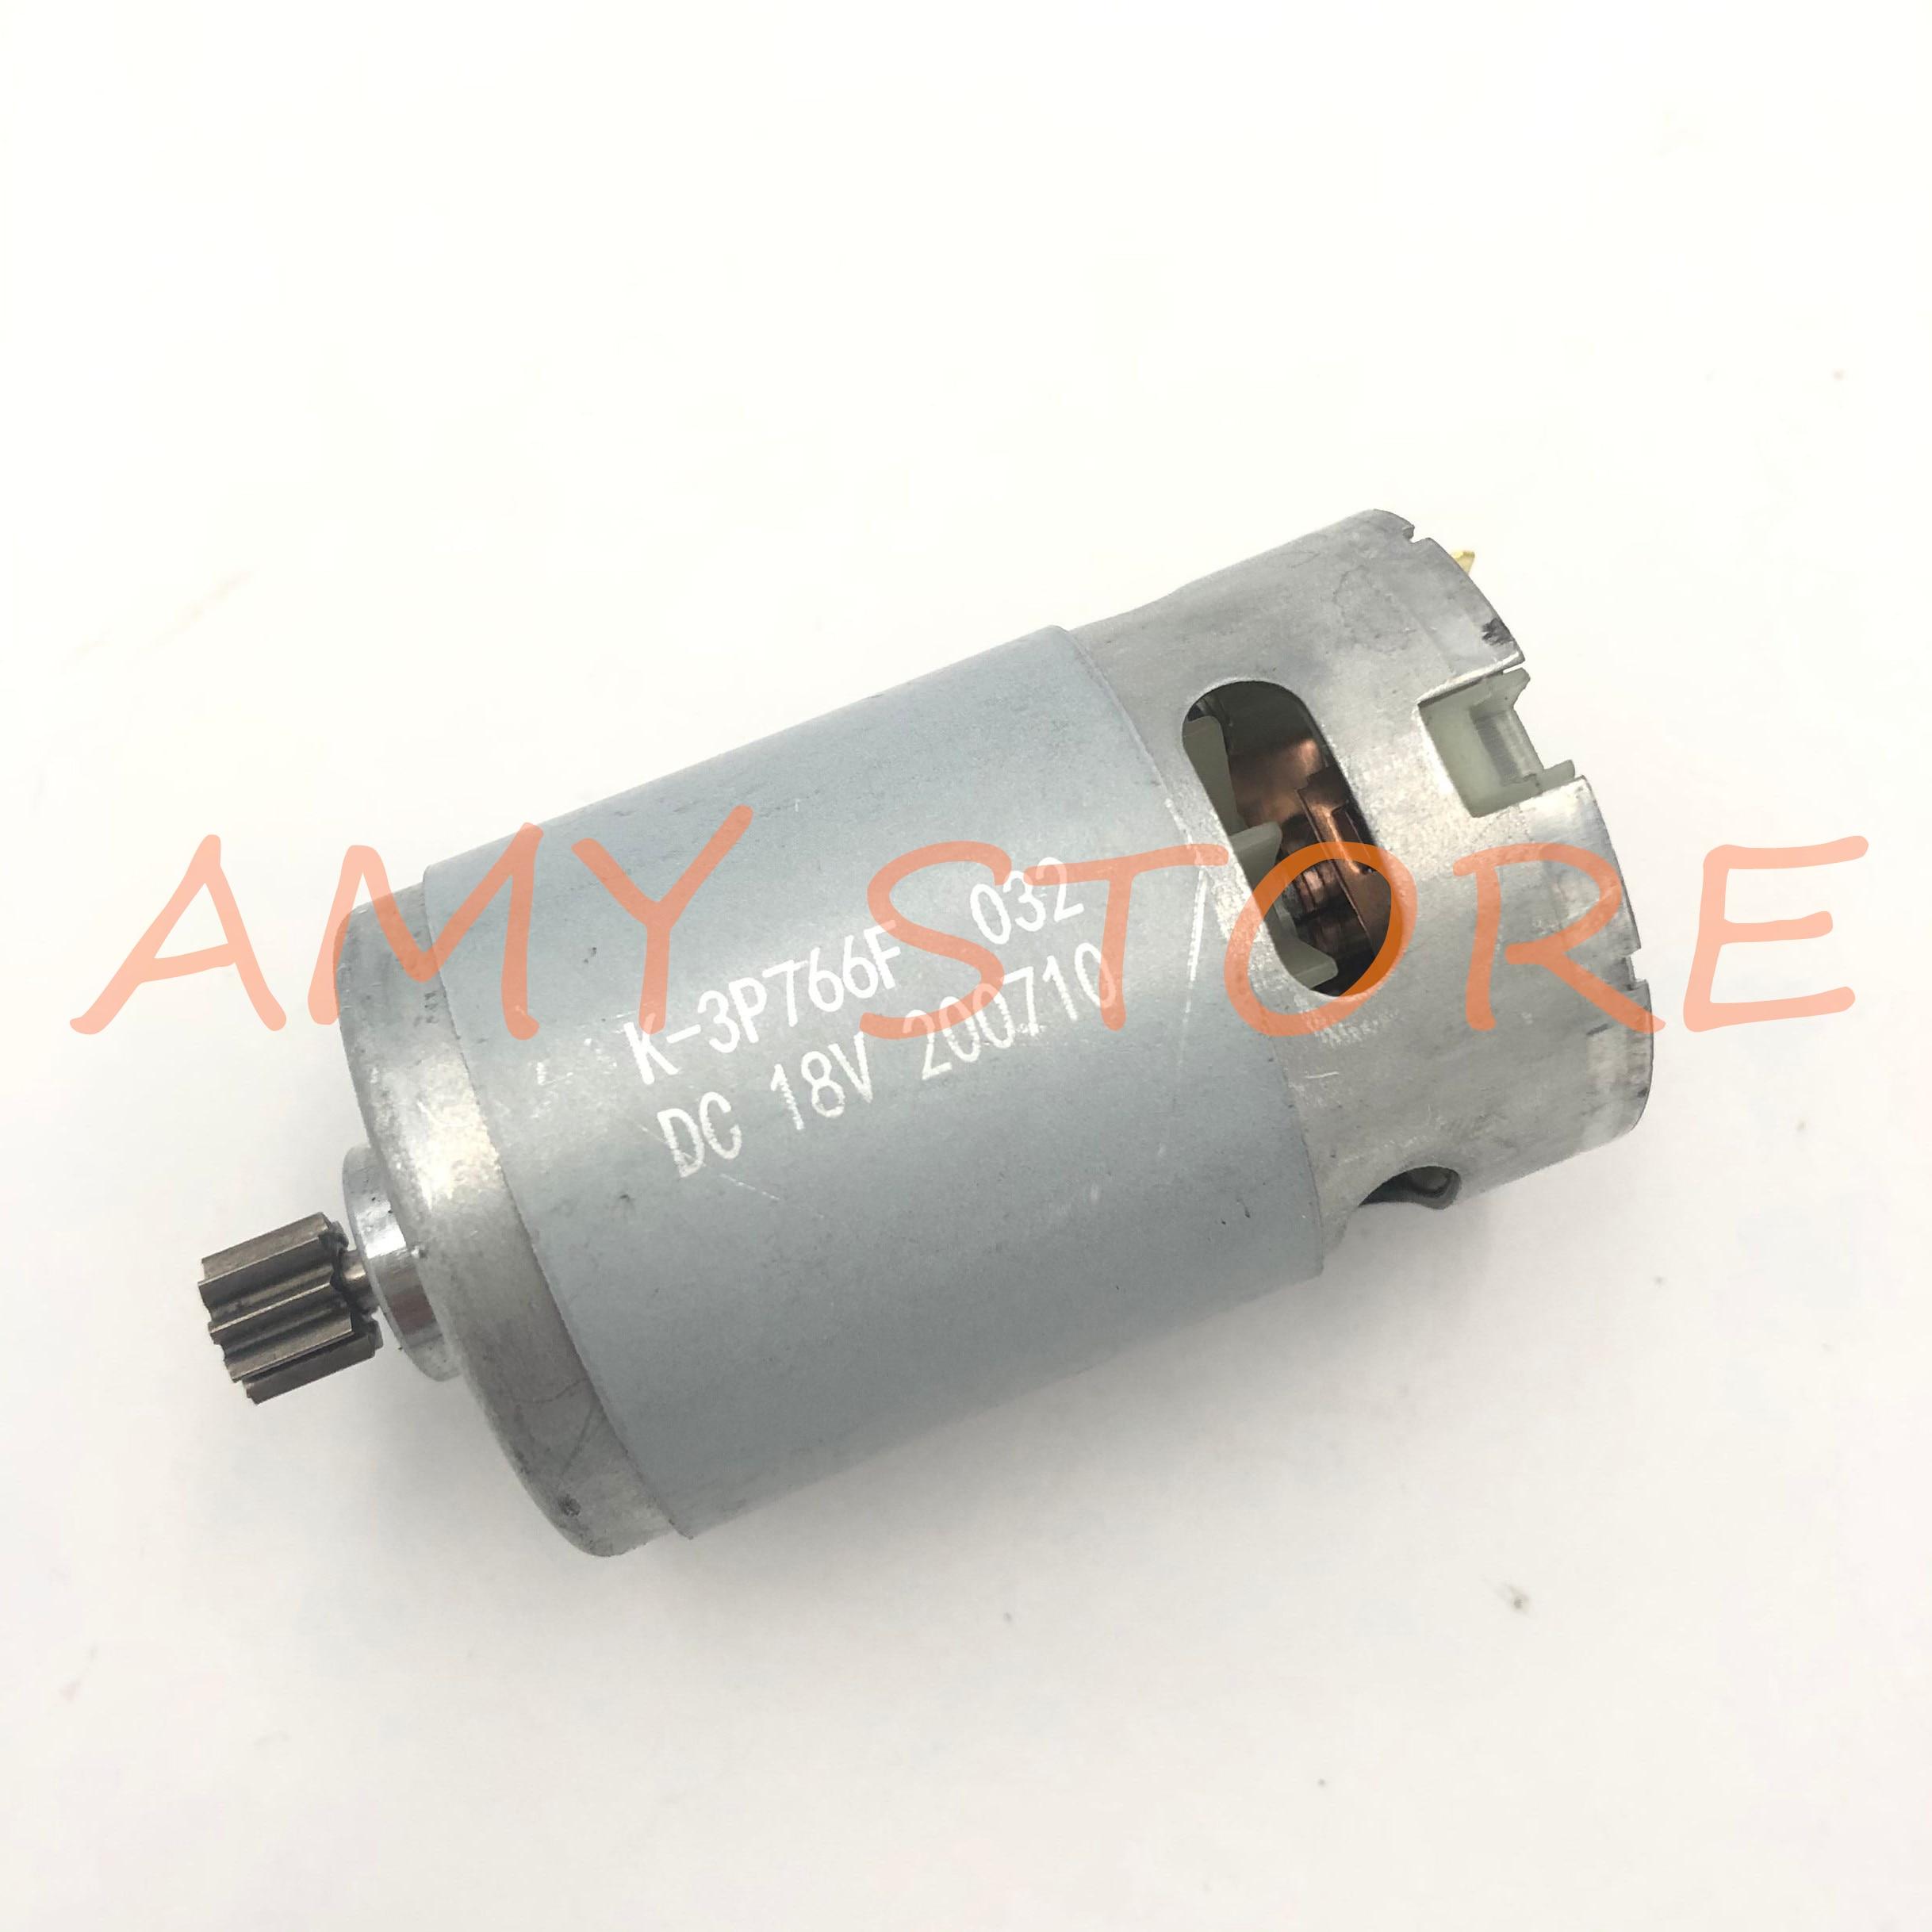 RS550 Motor 17 14 15 11 12Teeth 9Teeth 7.2 9.6 10.8 12V 14.4V 16.8 18V 21 25VGear 3mmShaft For Cordl